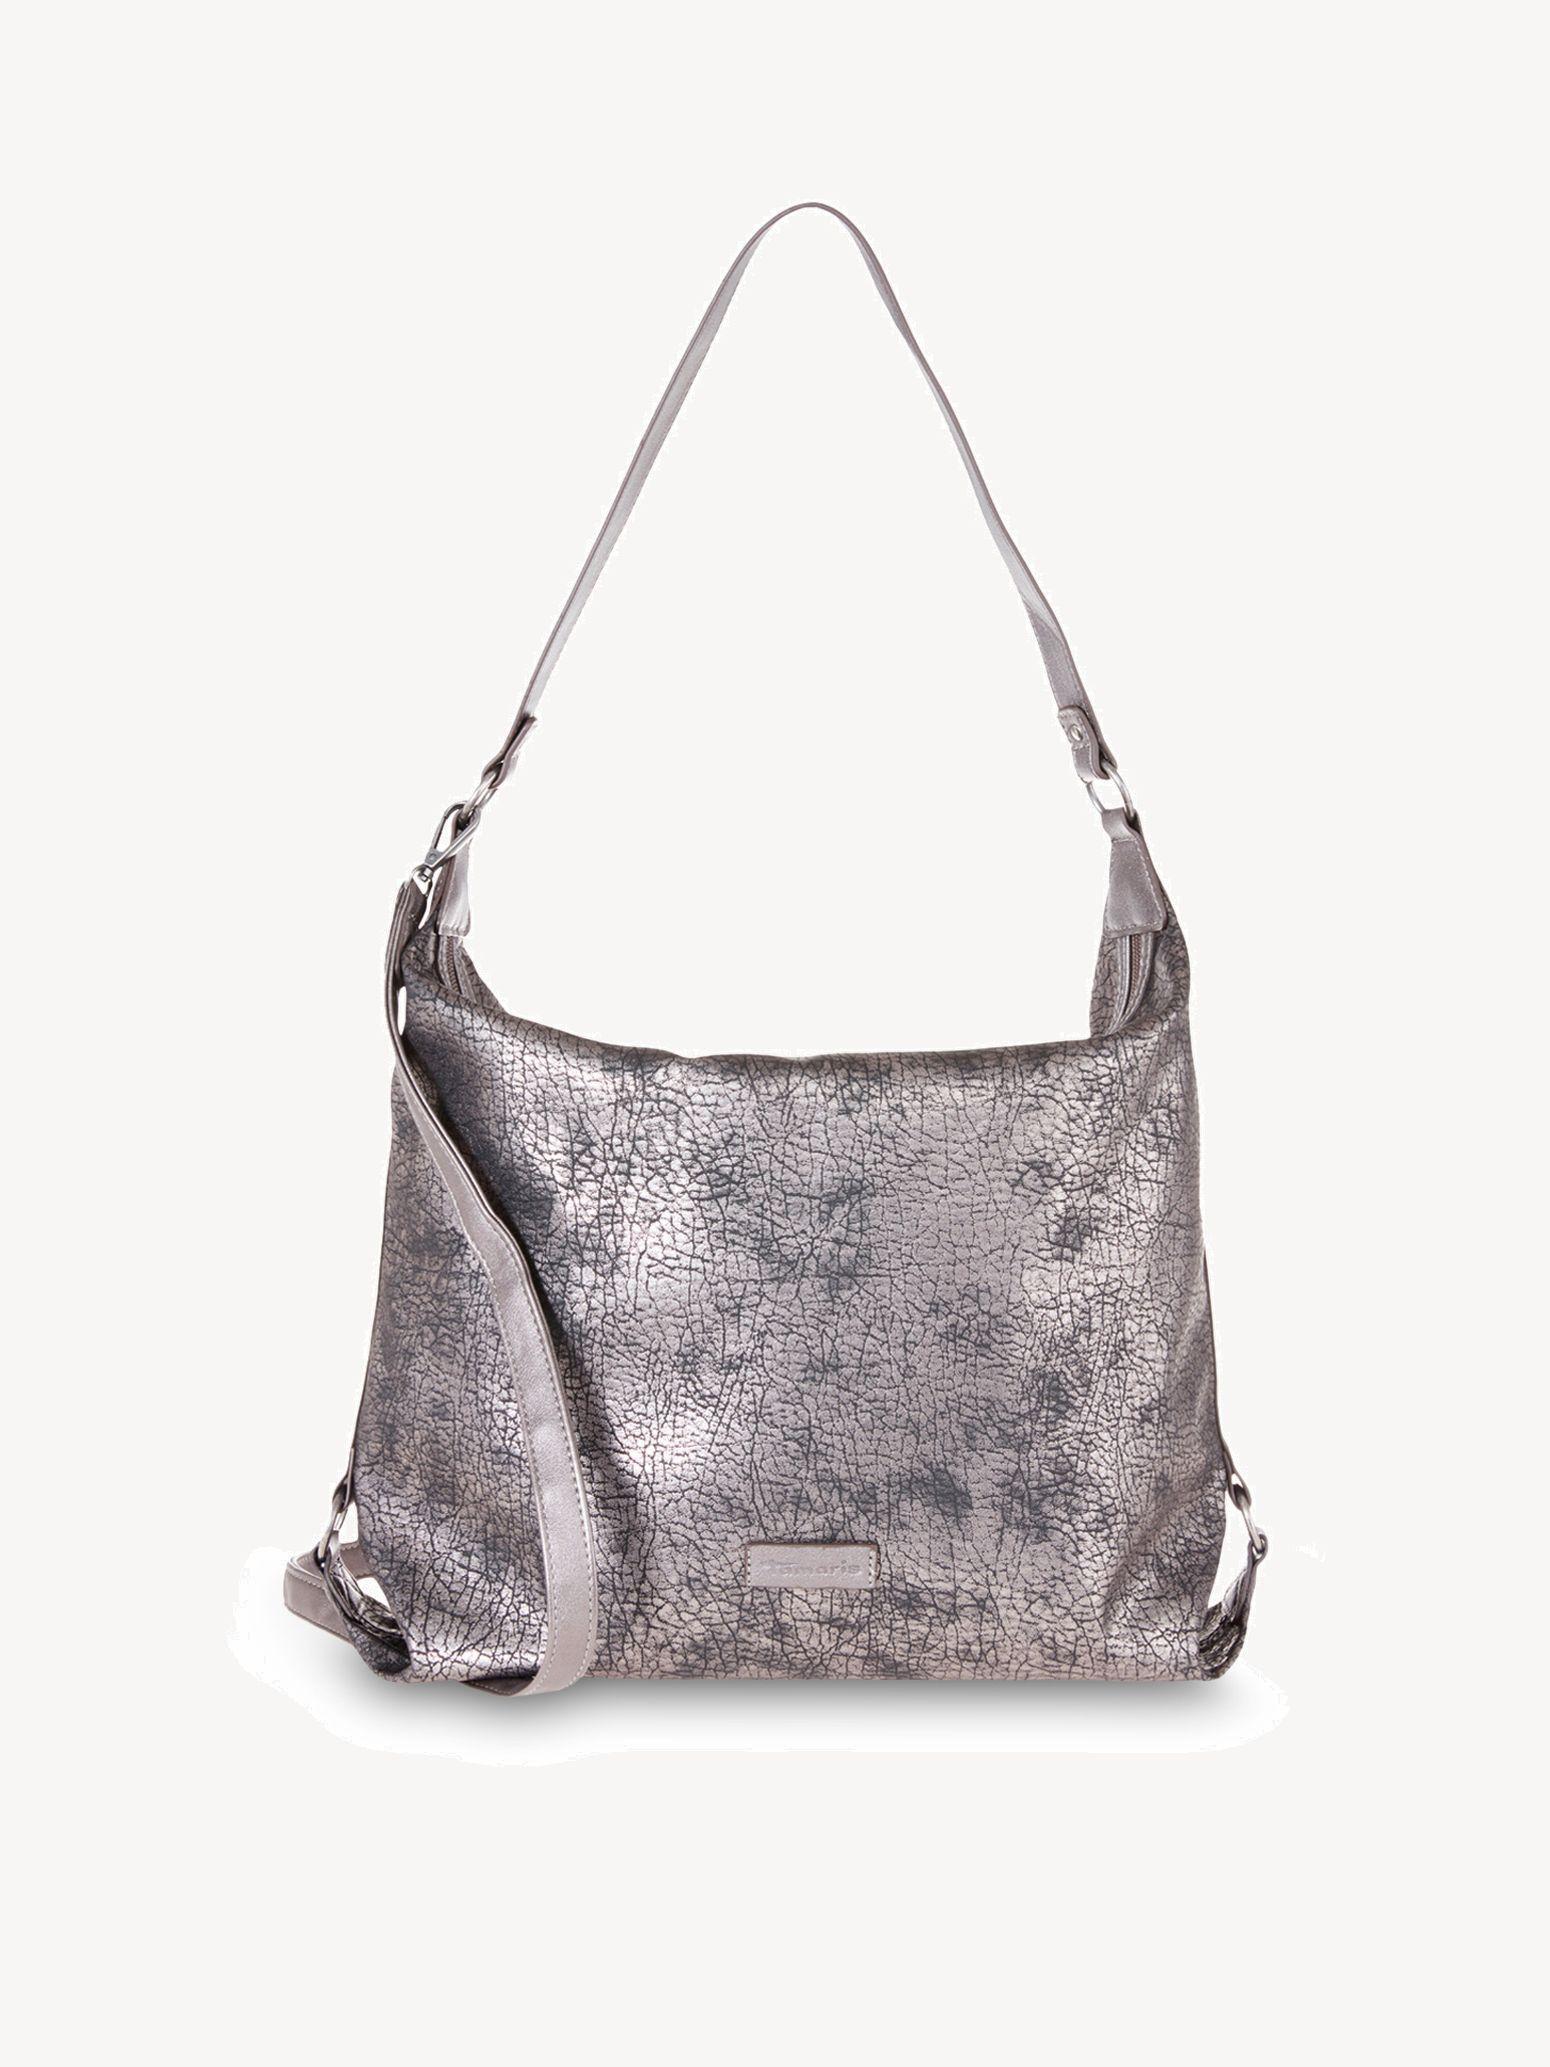 76b096694df Matilda 2176172: Buy Tamaris Handbags online!